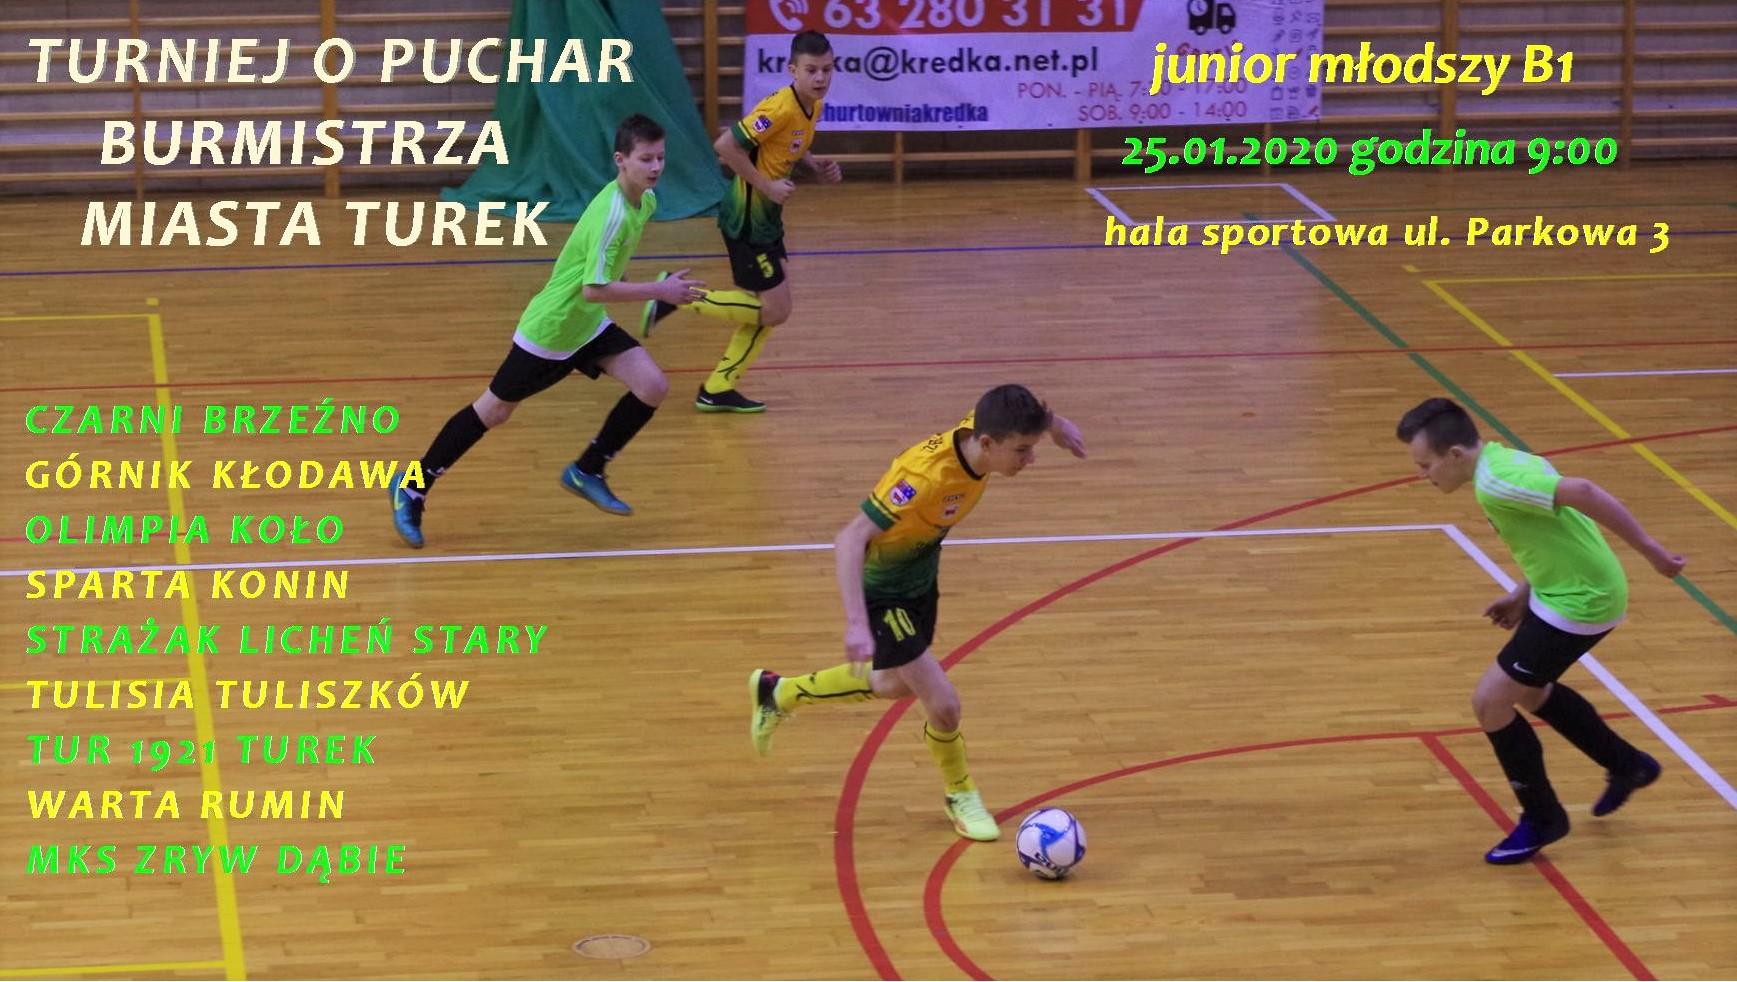 Turniej o Puchar Burmistrza Miasta Turek- junior B1